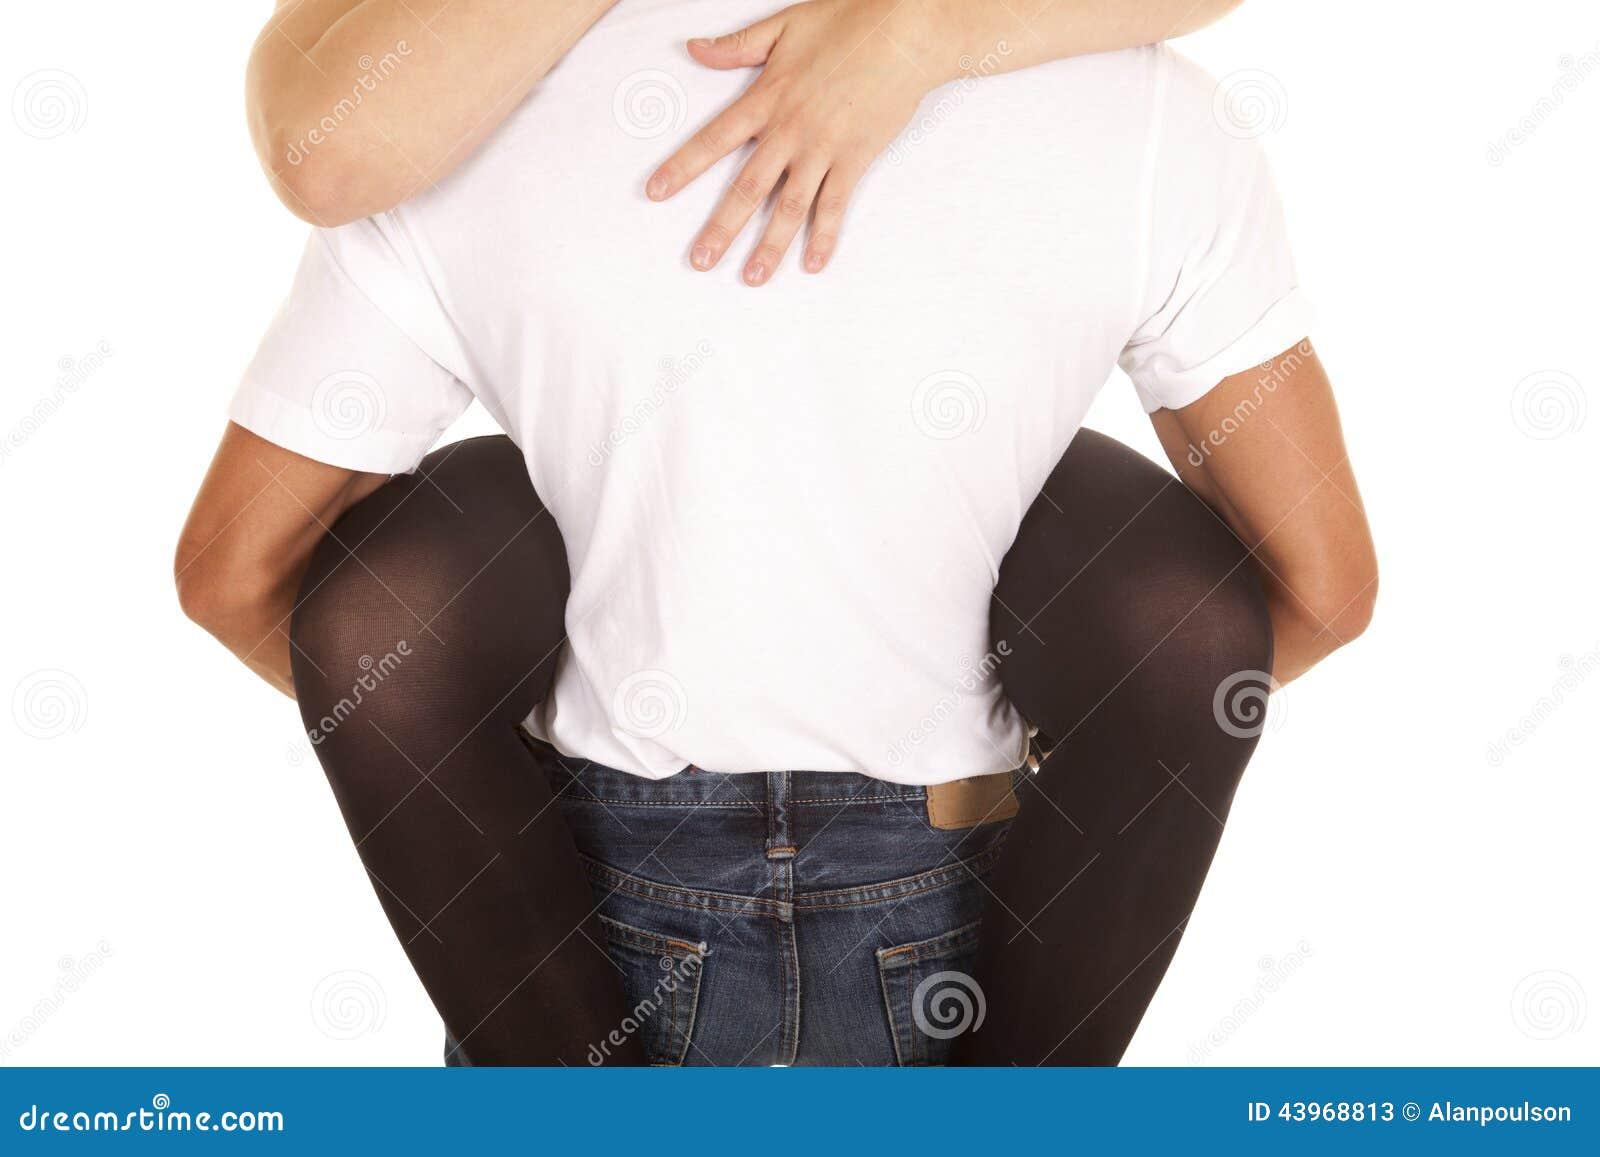 With woman hips man Ideal Waist